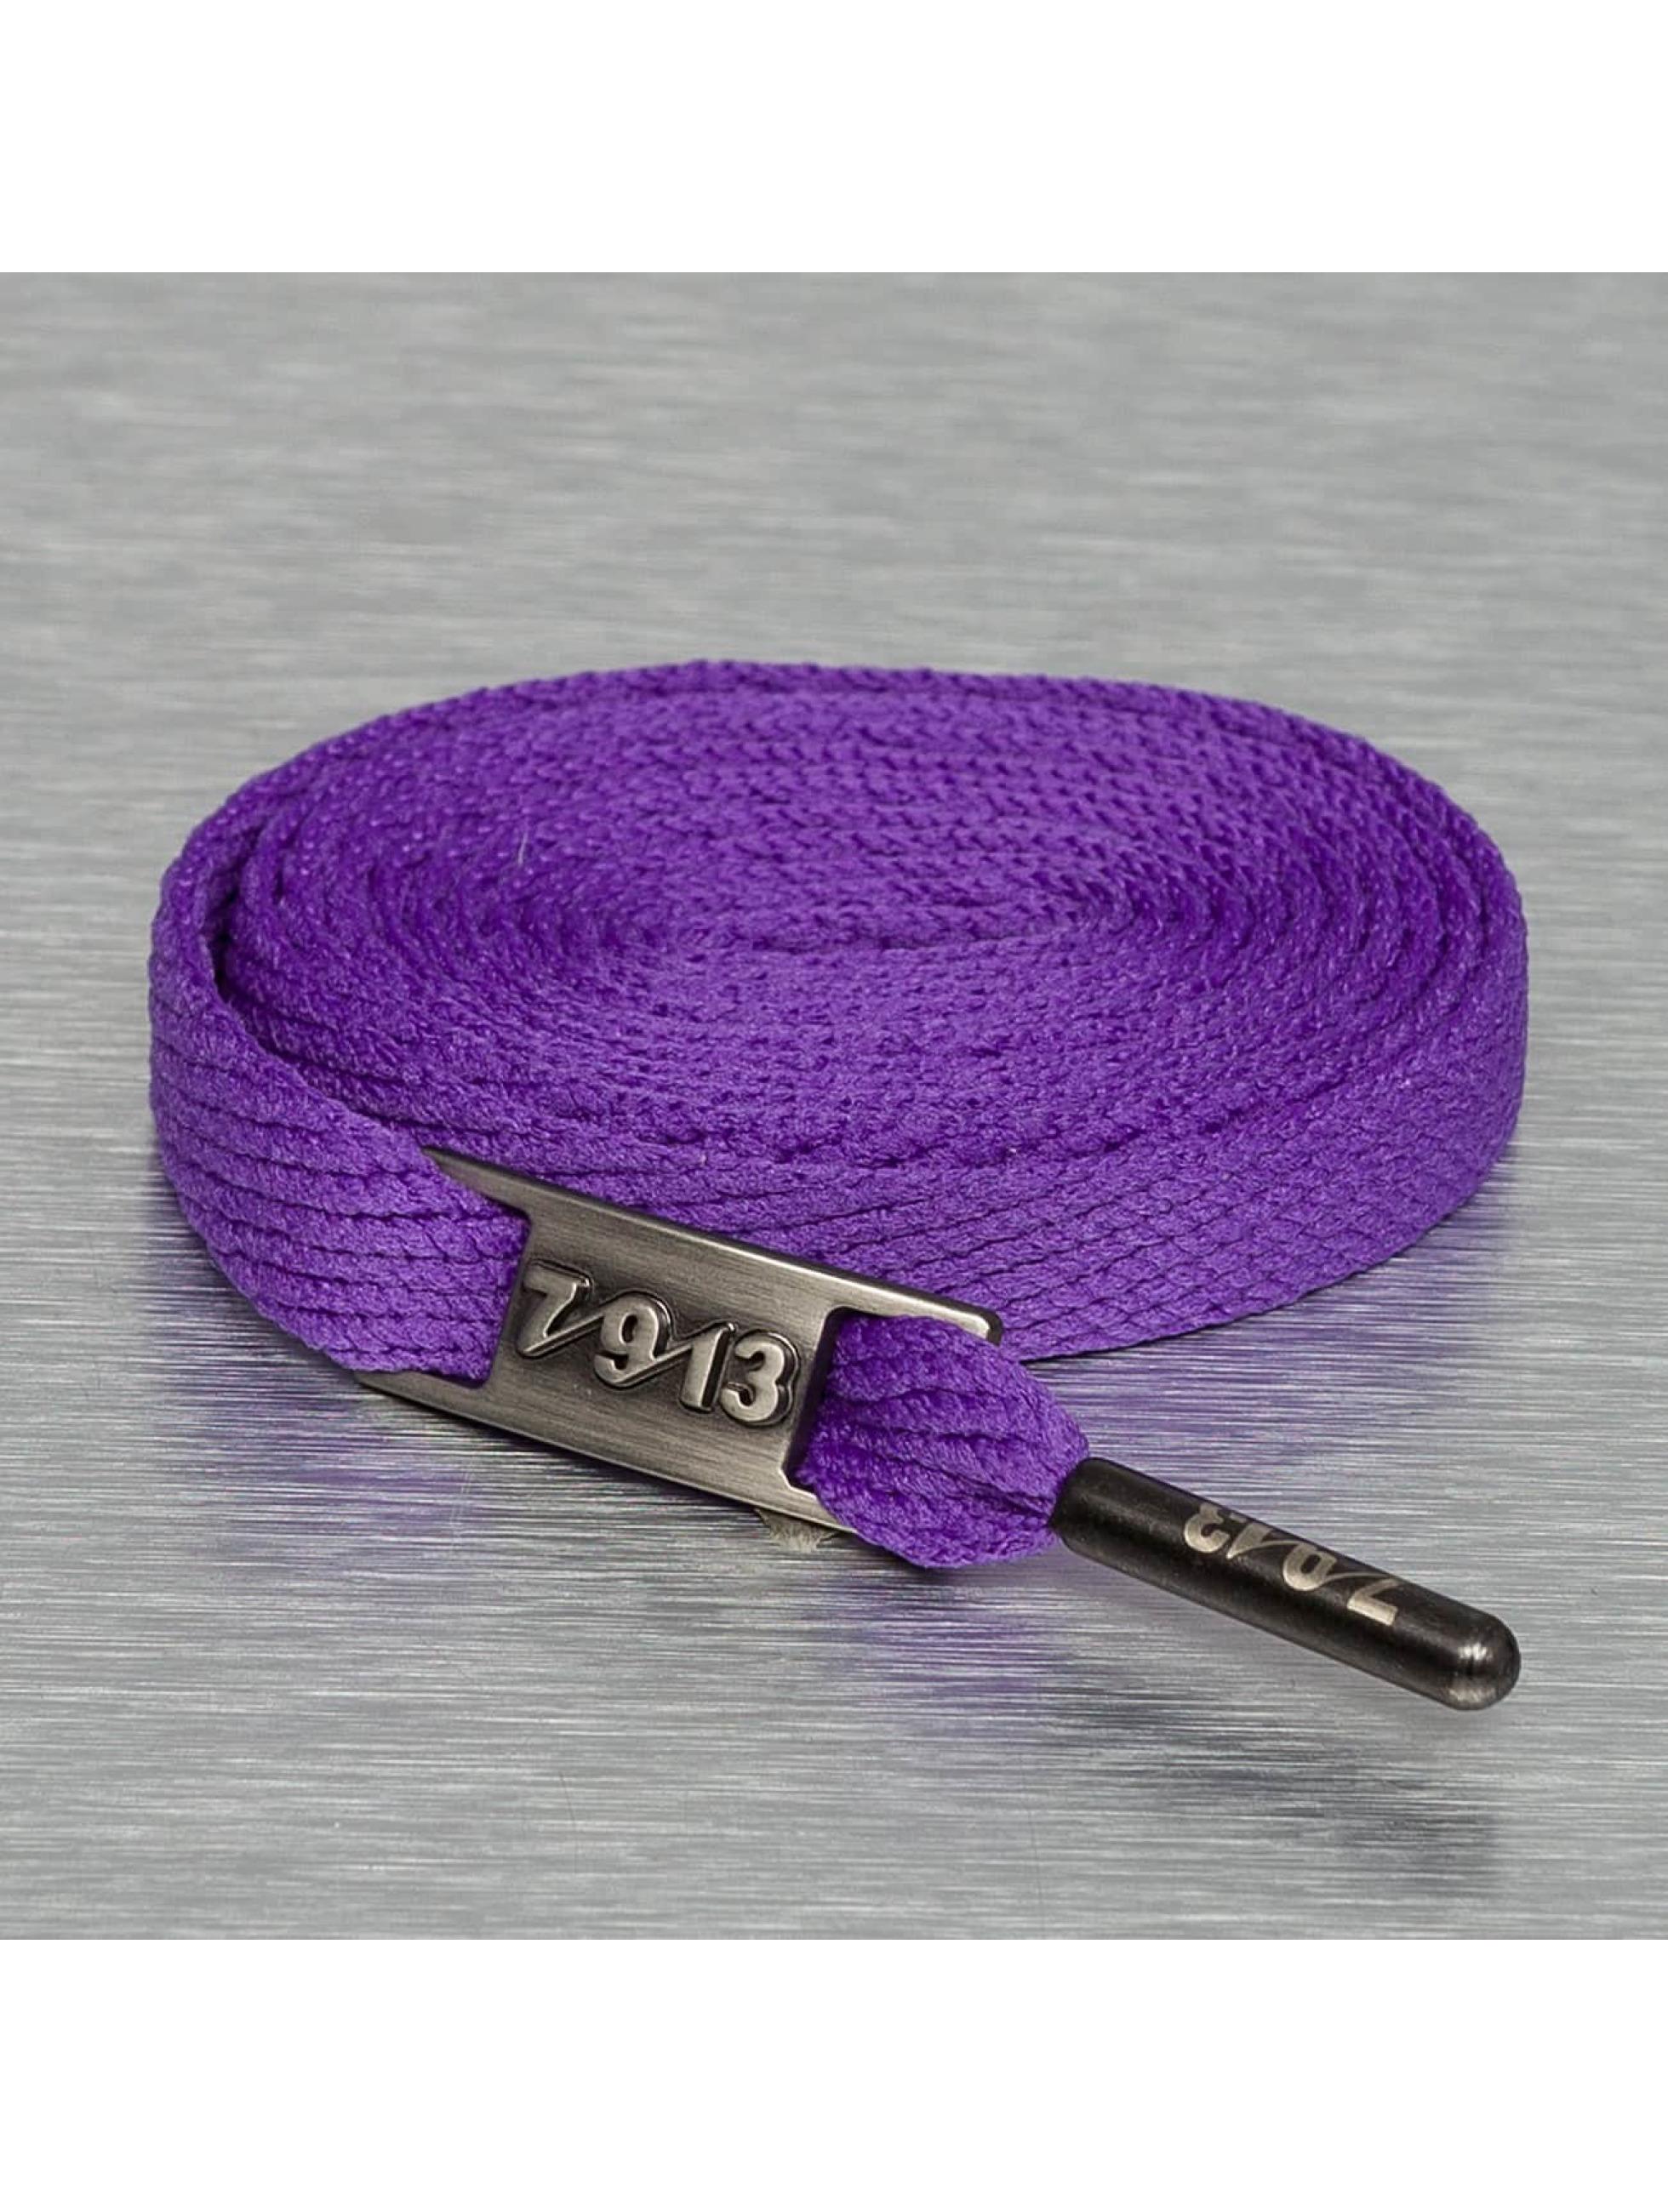 Seven Nine 13 Shoelace Full Metal purple